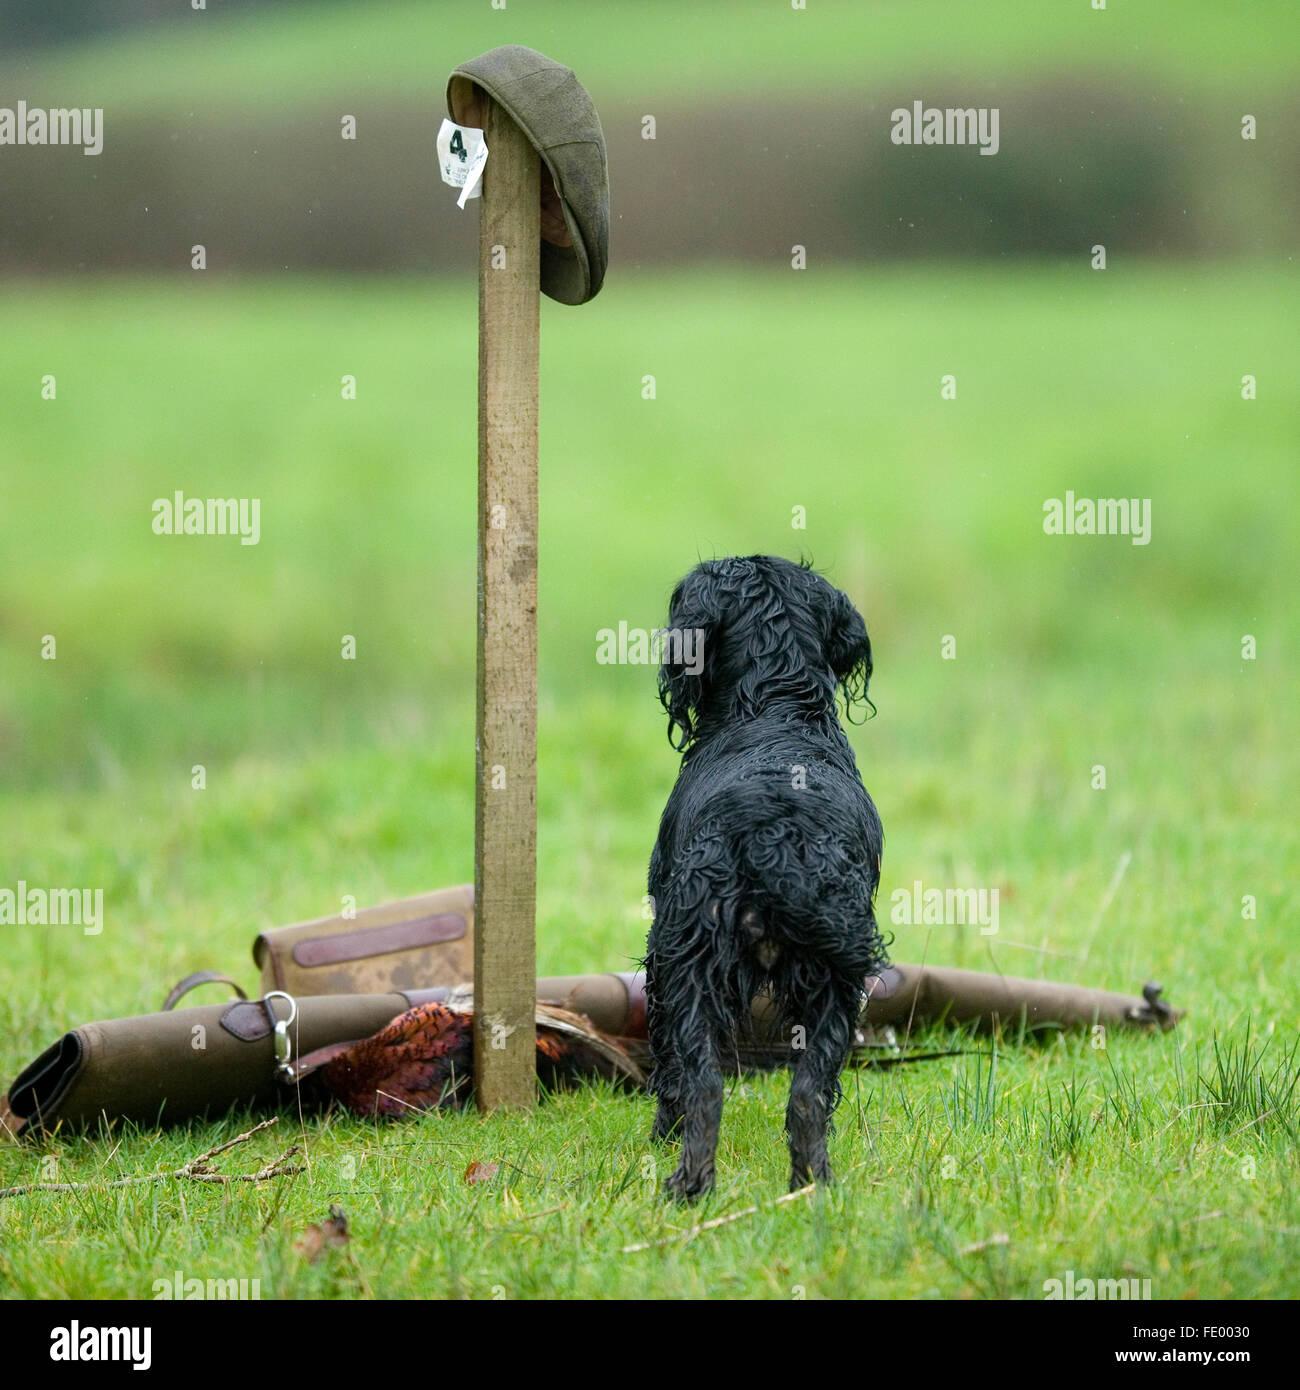 cocker spaniel on peg at a shoot - Stock Image